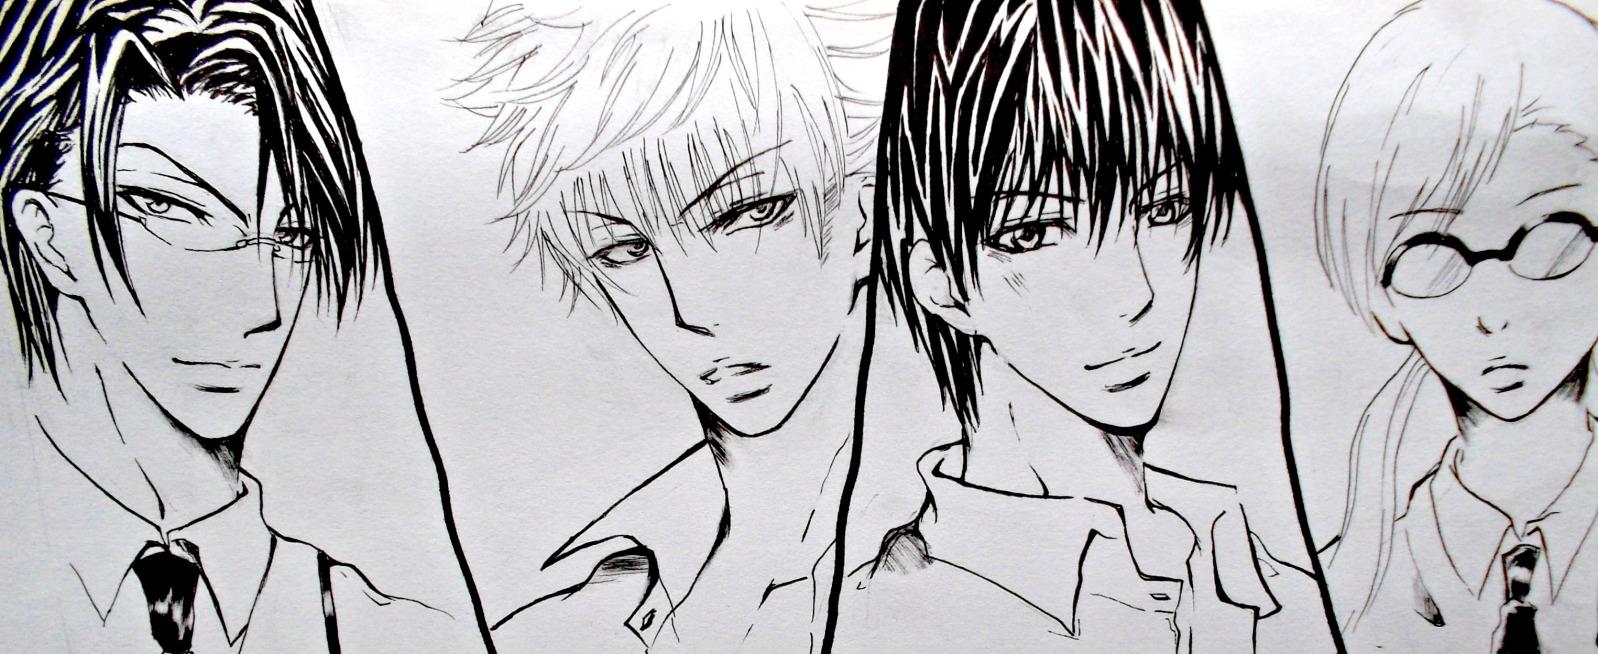 Bishounen Gakunen: Gakuen Ouji By GinIgarashi On DeviantArt